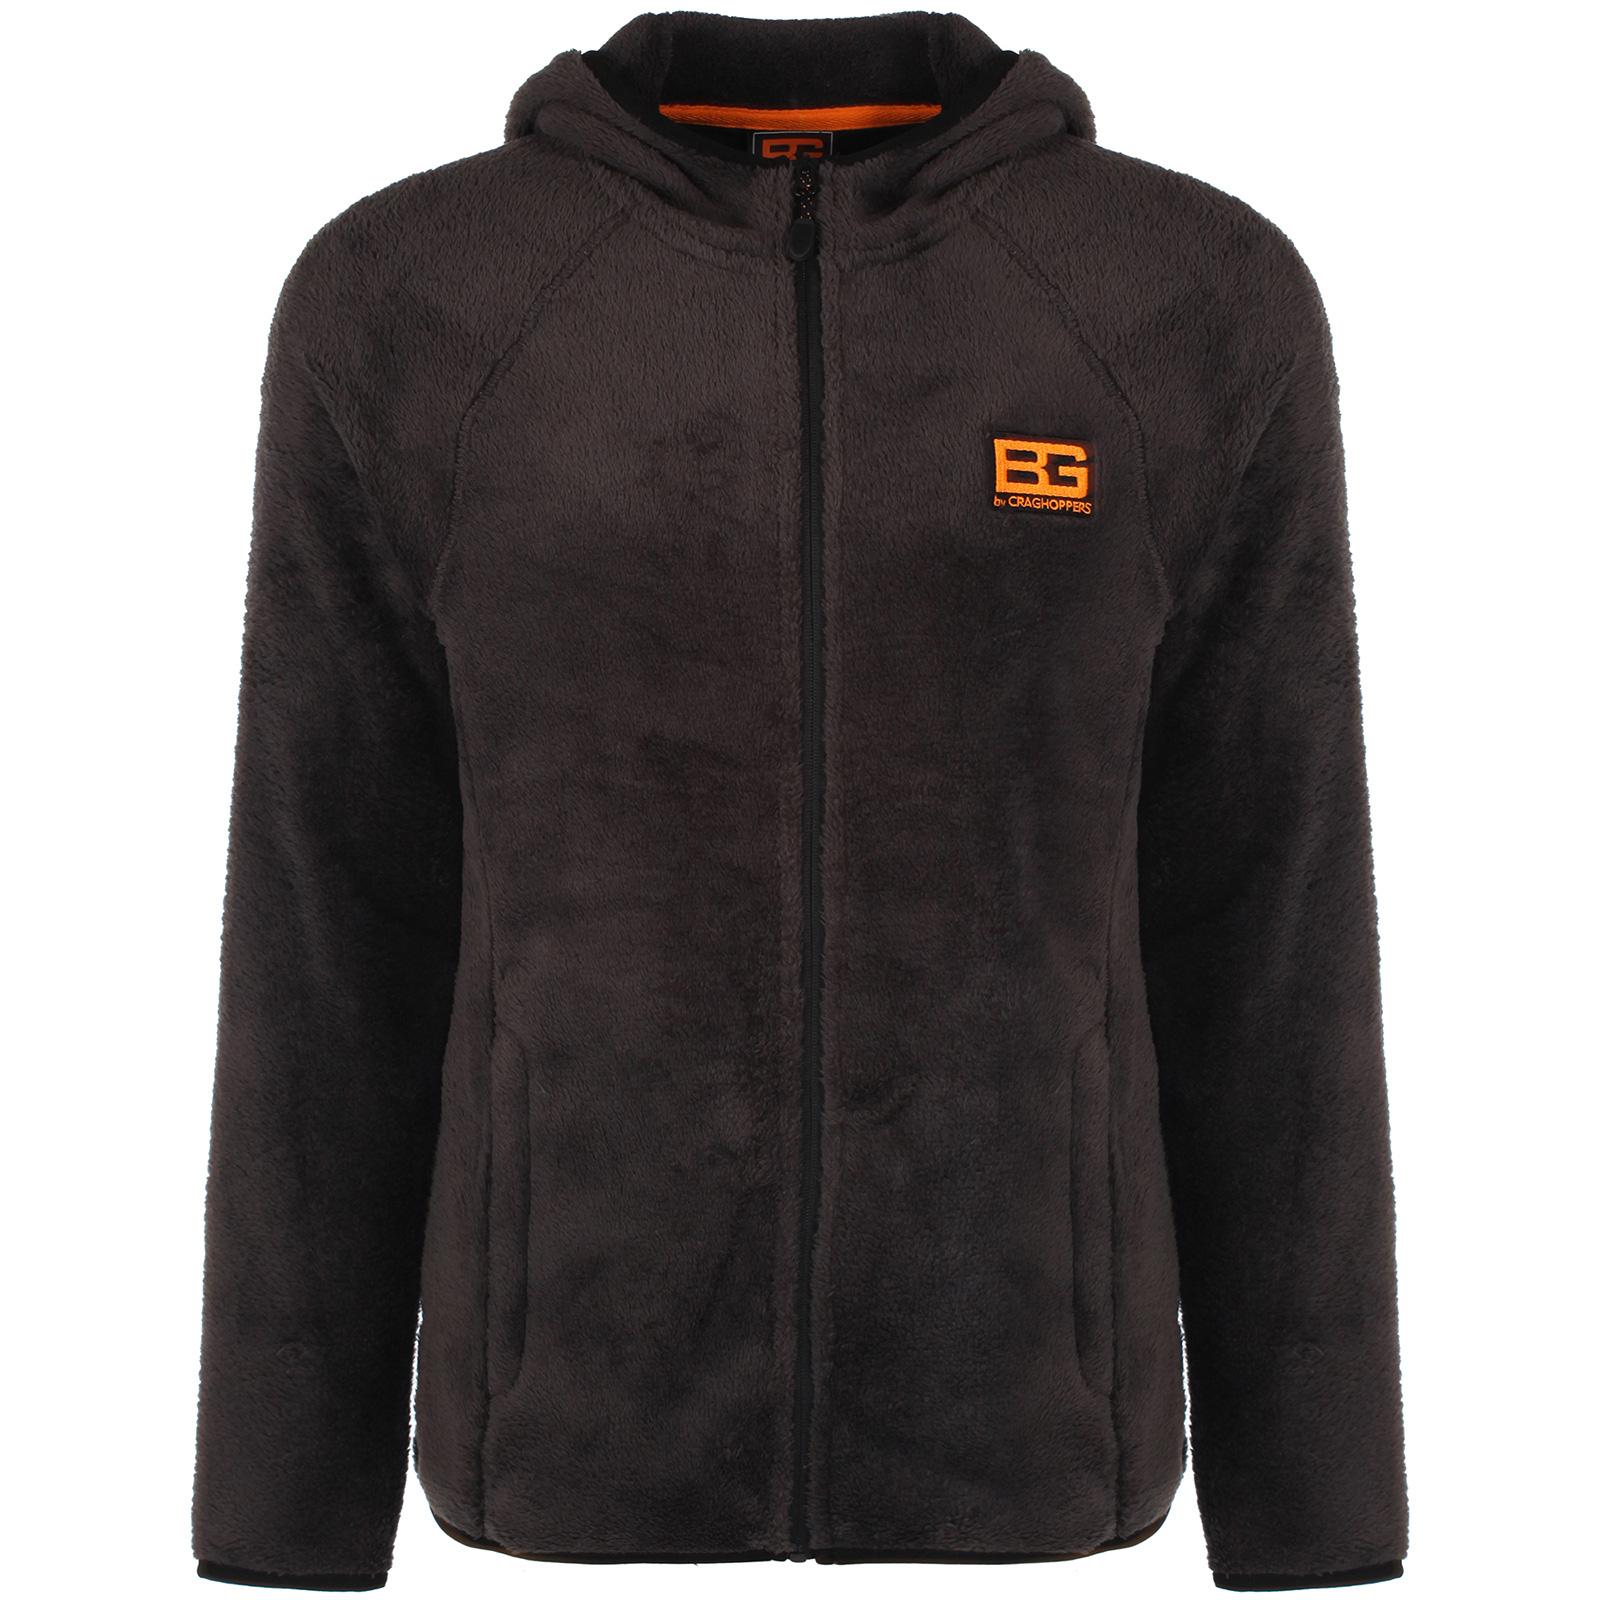 Bear Grylls Jackets | Bear Grylls Clothing | Bear Grylls Amazon